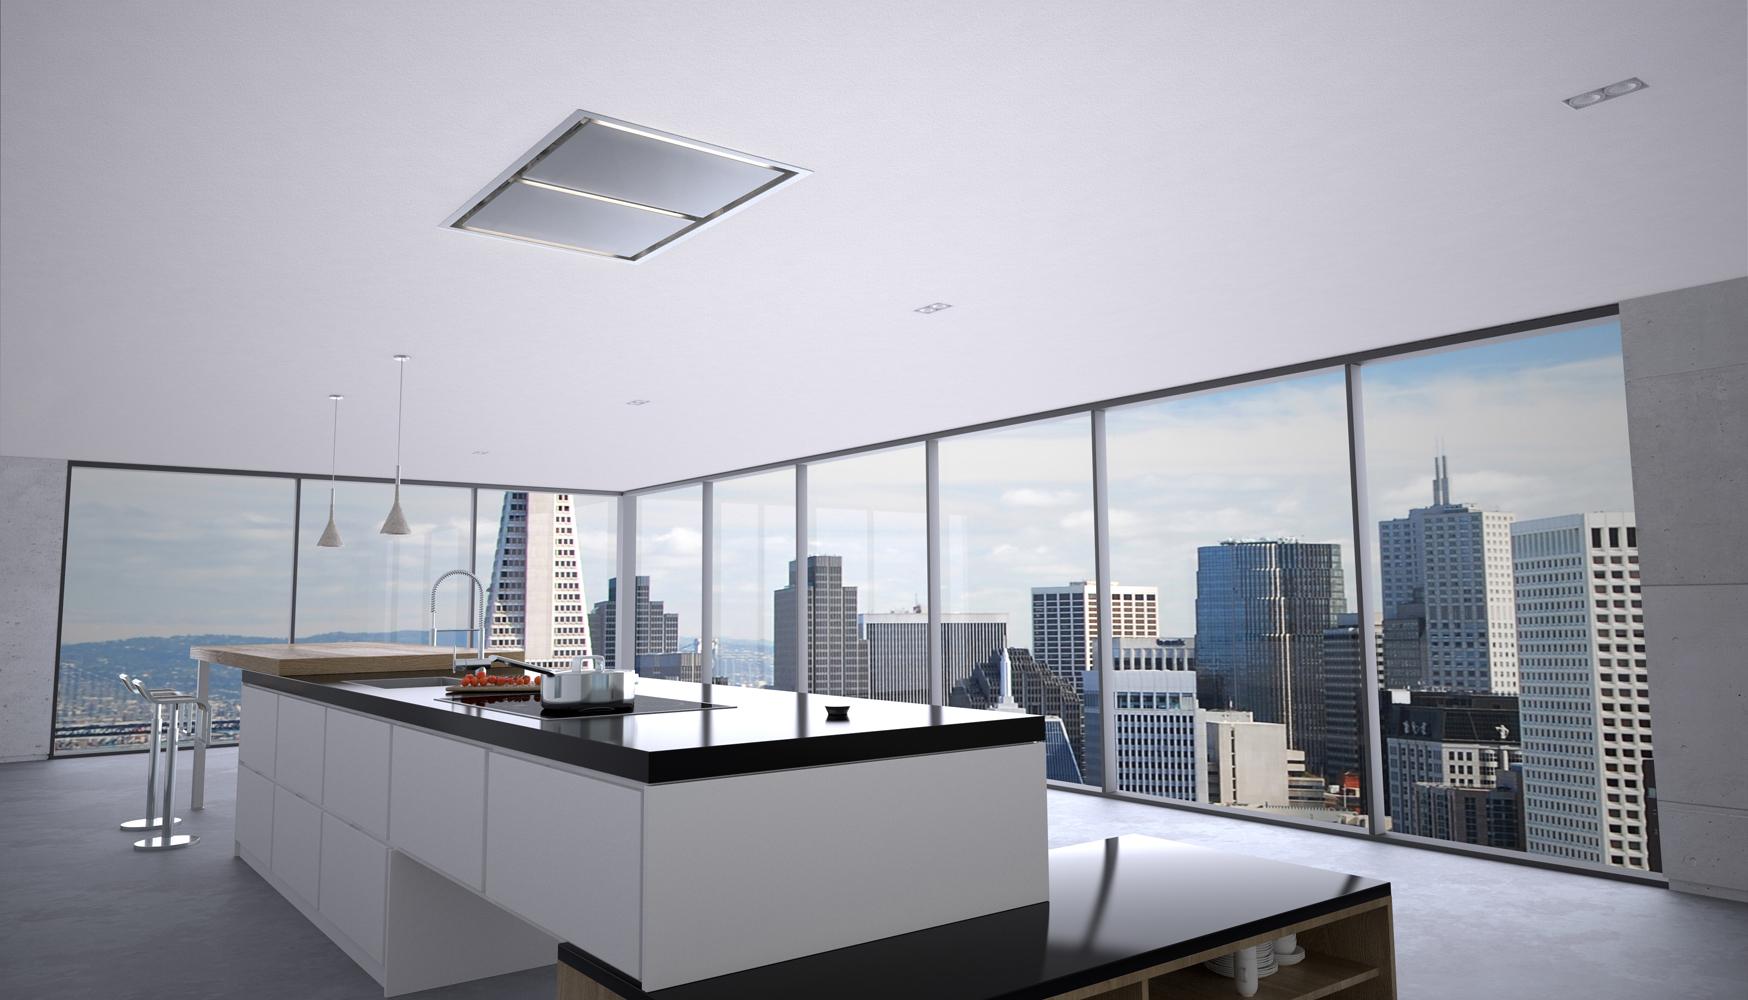 Zephyrs Lux Island Kitchen Ventilation Hood Mounts In